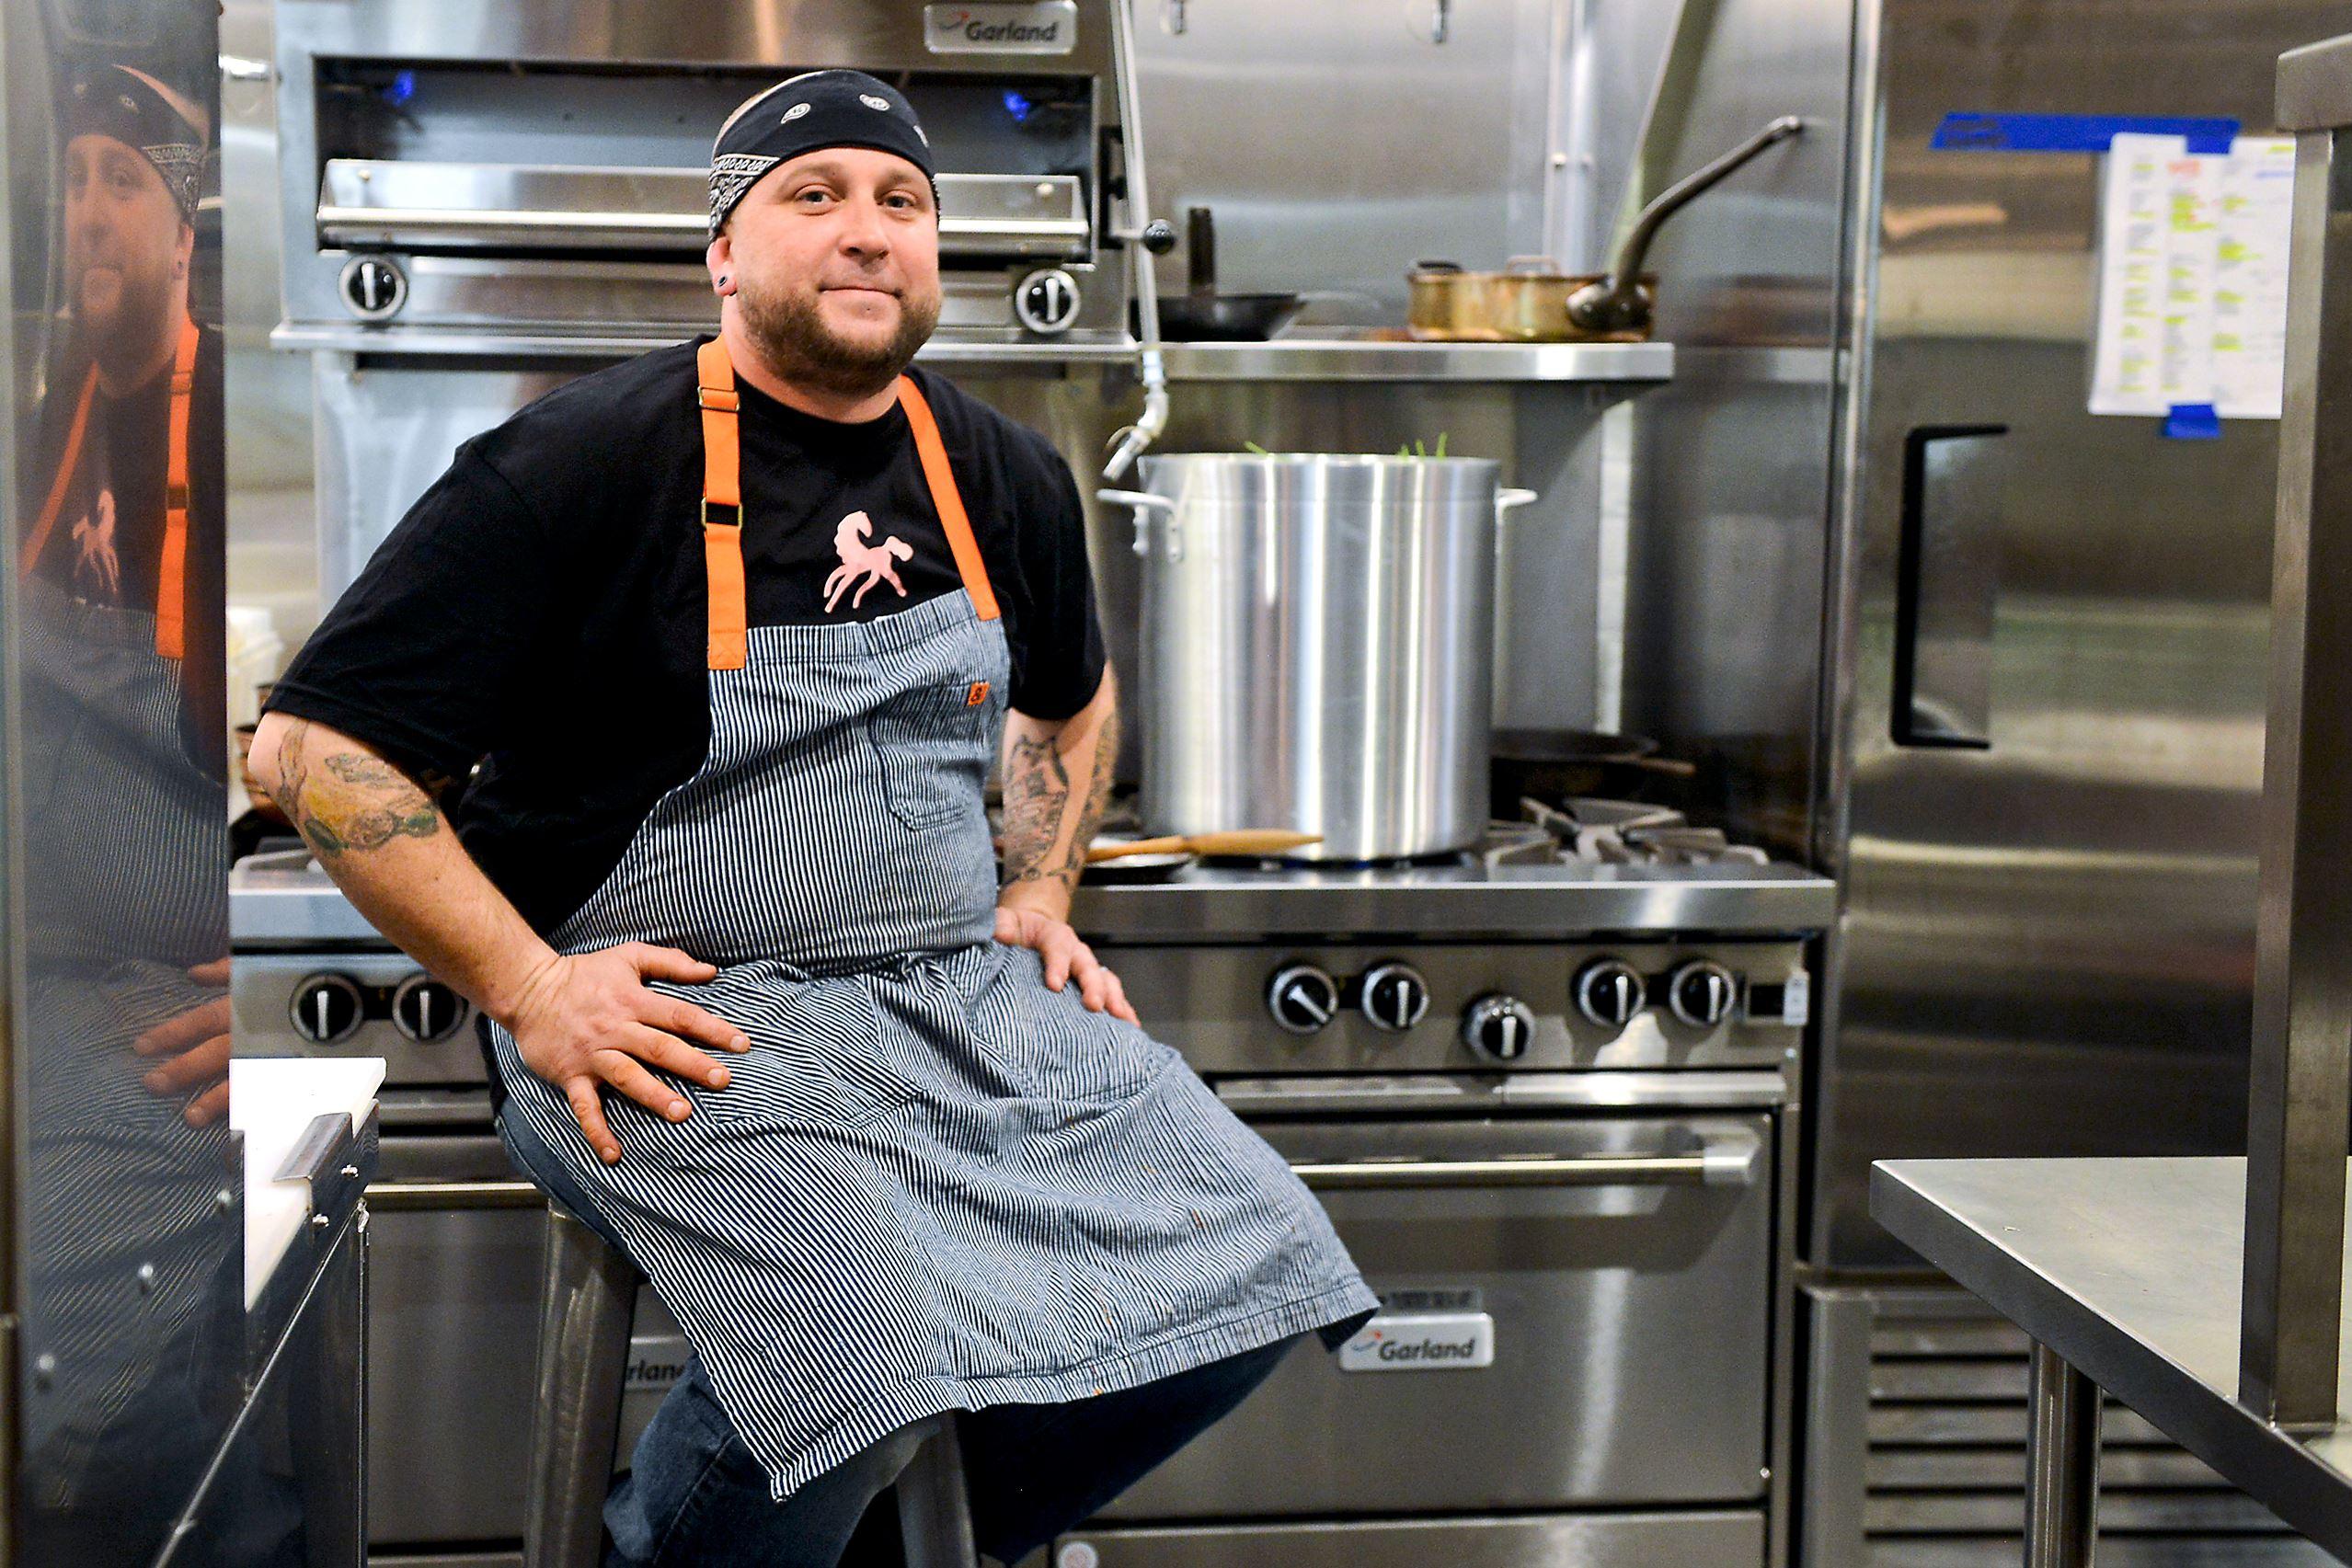 20151213JRTable1 Stephen Eldridge in his kitchen at Smallman Galley Saturday in the Strip District.